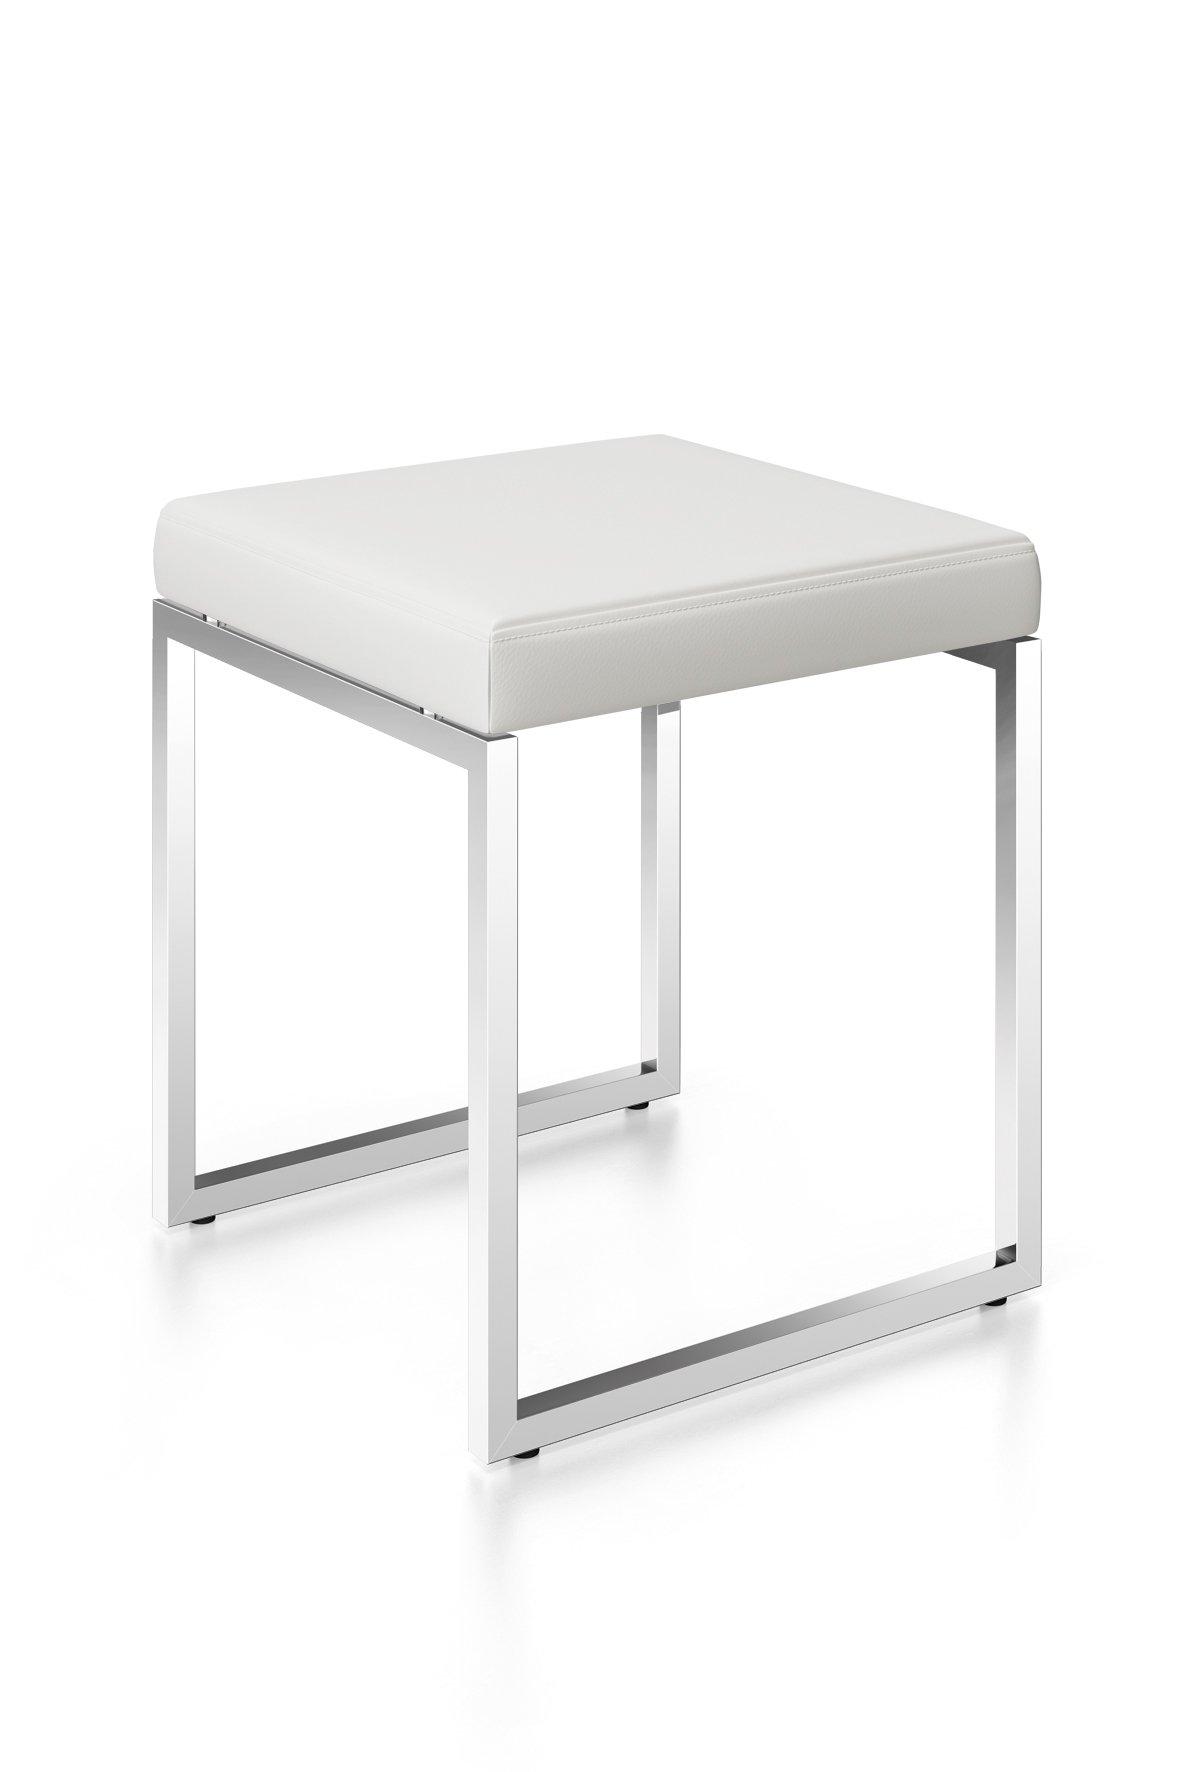 Zack 40334 Original CENIUS Stool White, Leather seat, high Gloss 17.9 x 15.7 x 15.7 in, 17.9'' x 15.7''